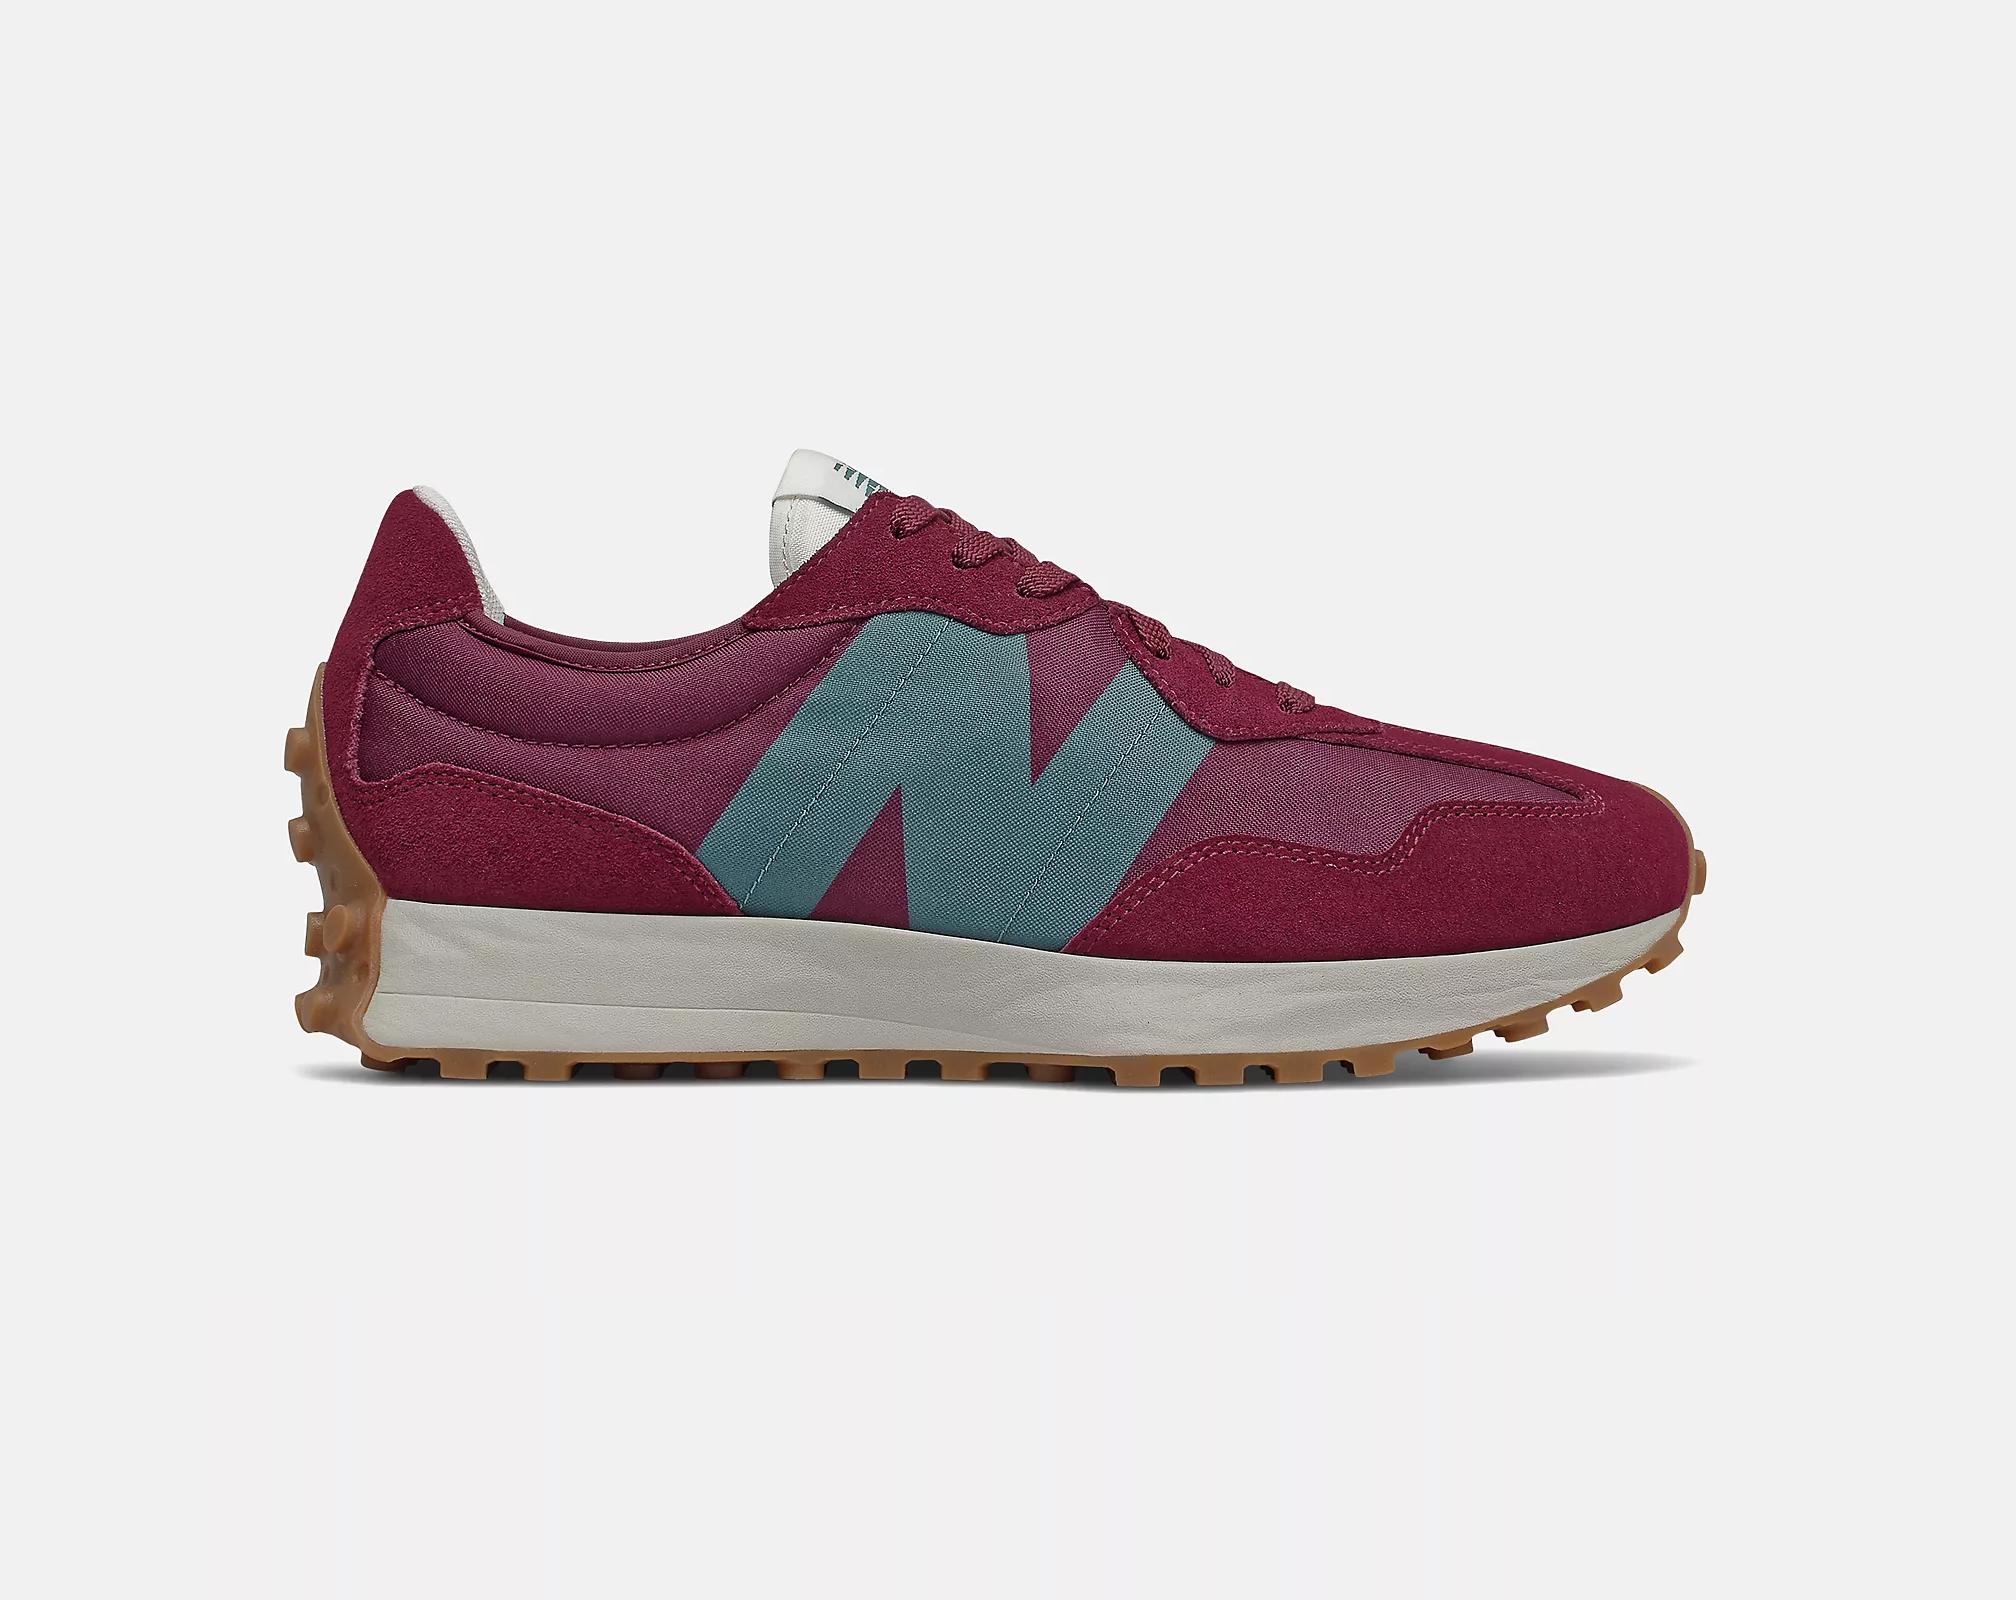 New Balance 327 'Garnet/Natural Indigo'